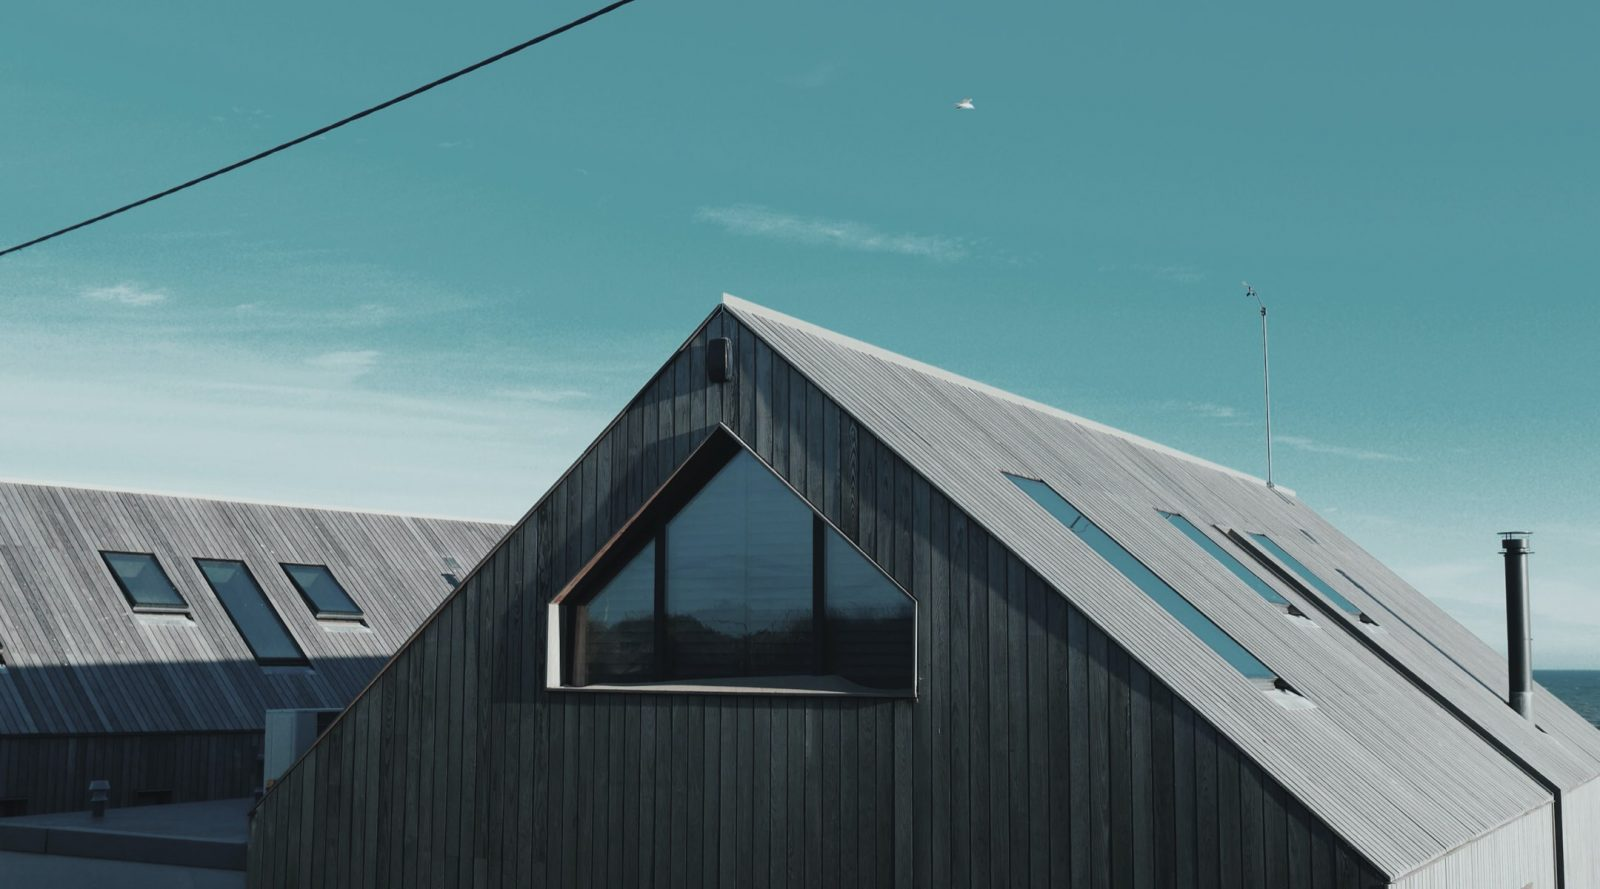 Hustak i trä med glasfönster